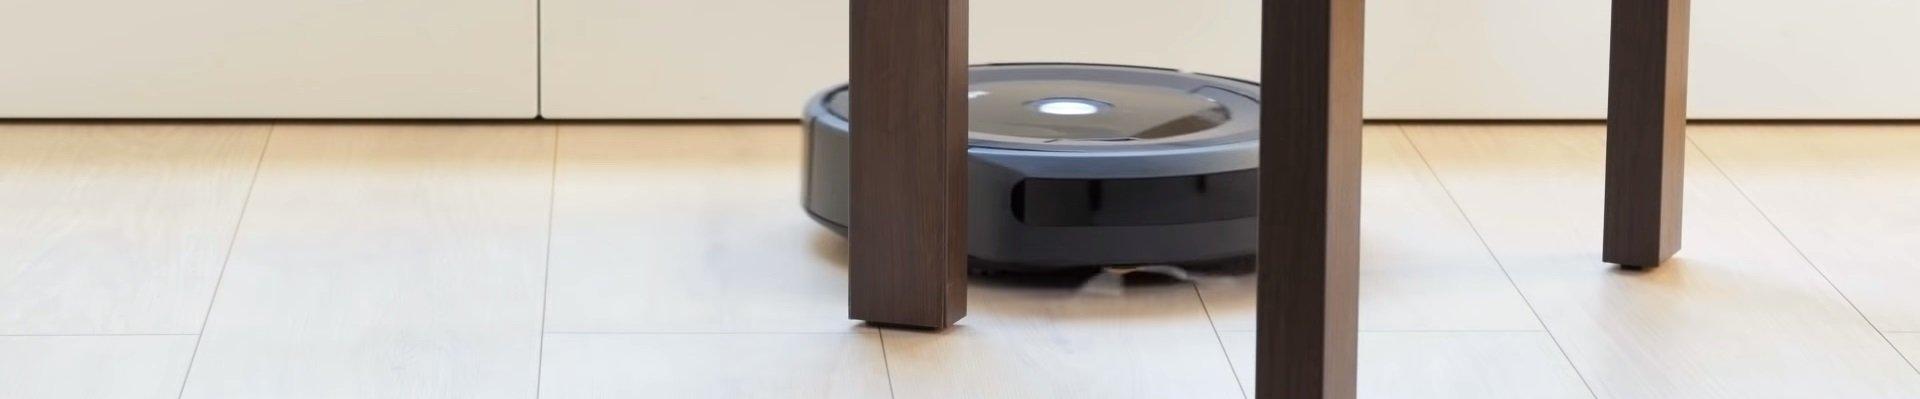 iRobot Roomba 695 vs iRobot Roomba 690: Robot Vacuum Comparison